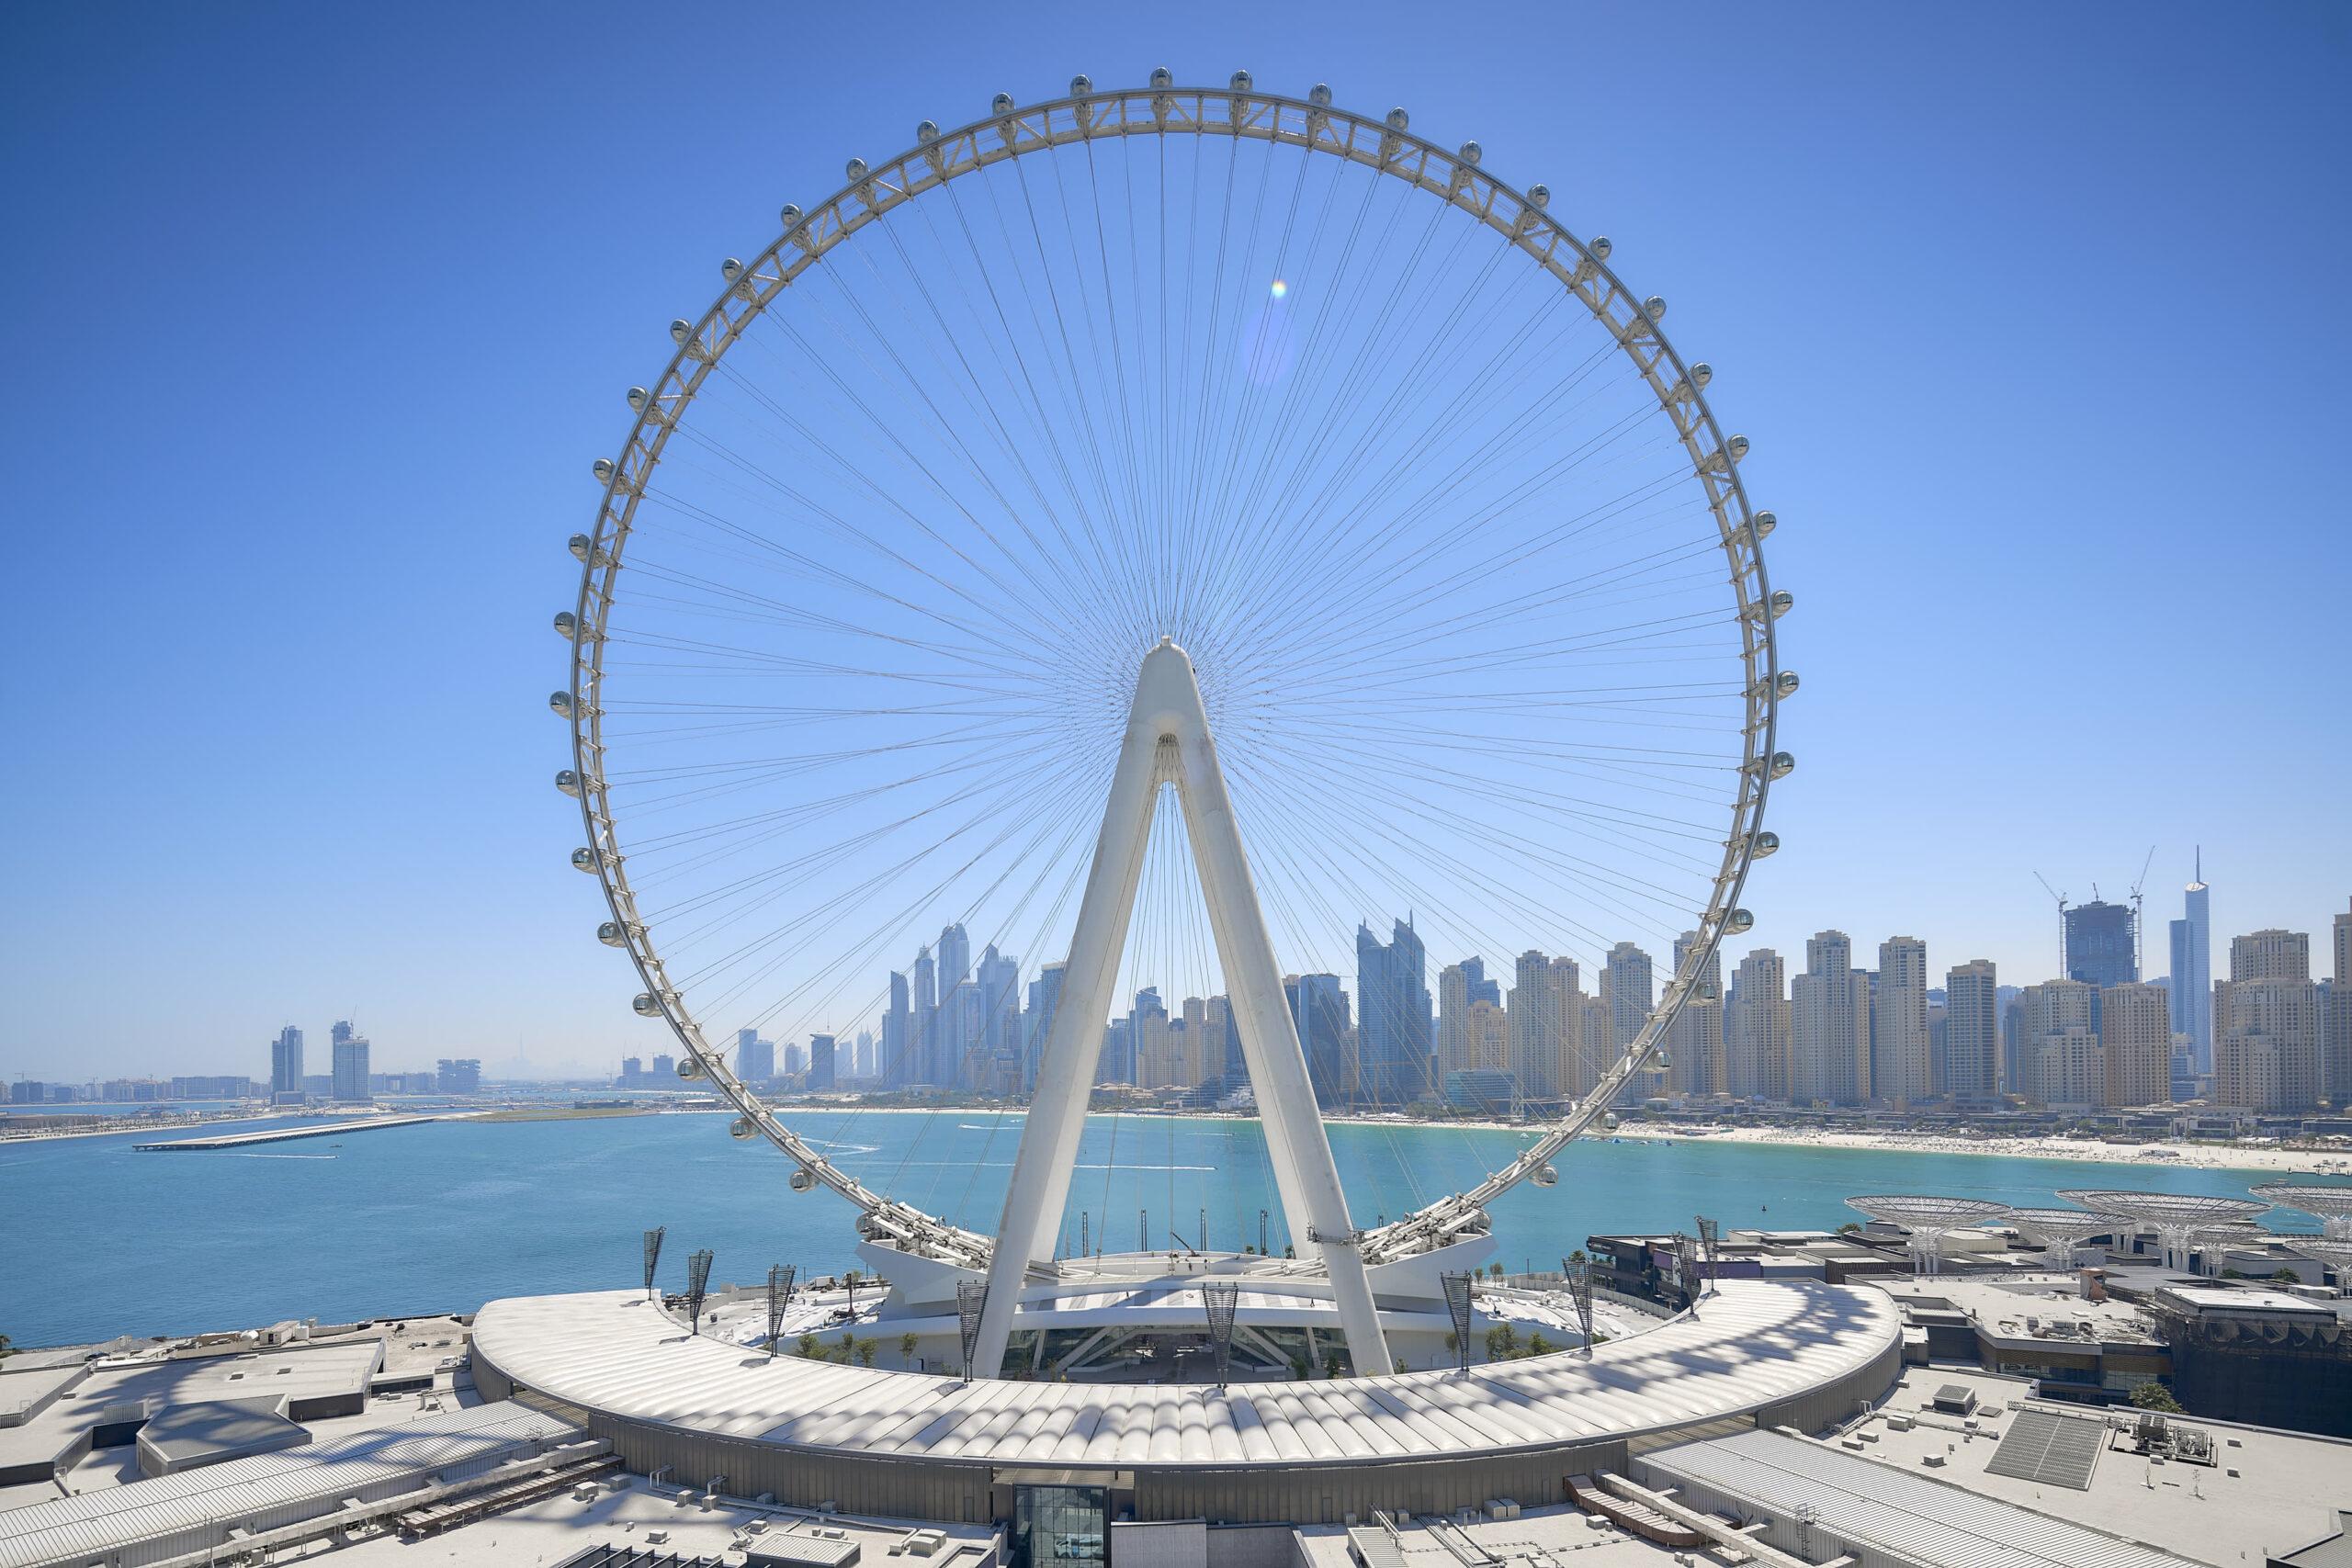 Ain Dubai, the world's largest ferris wheel, is opening in Dubai